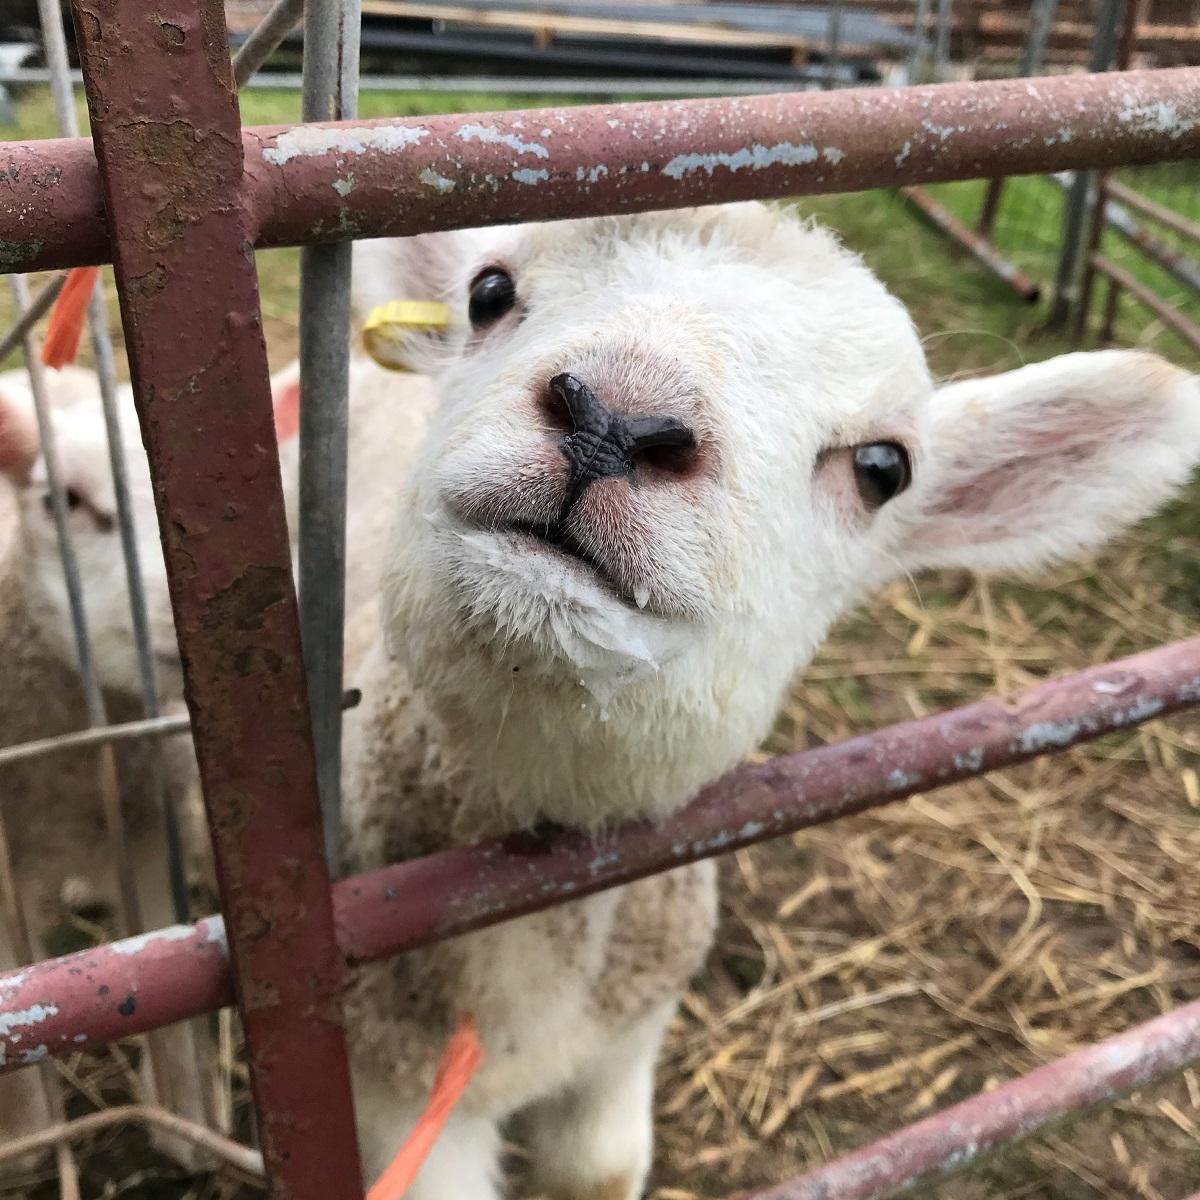 Lamb close-up at Valleyside Escapes